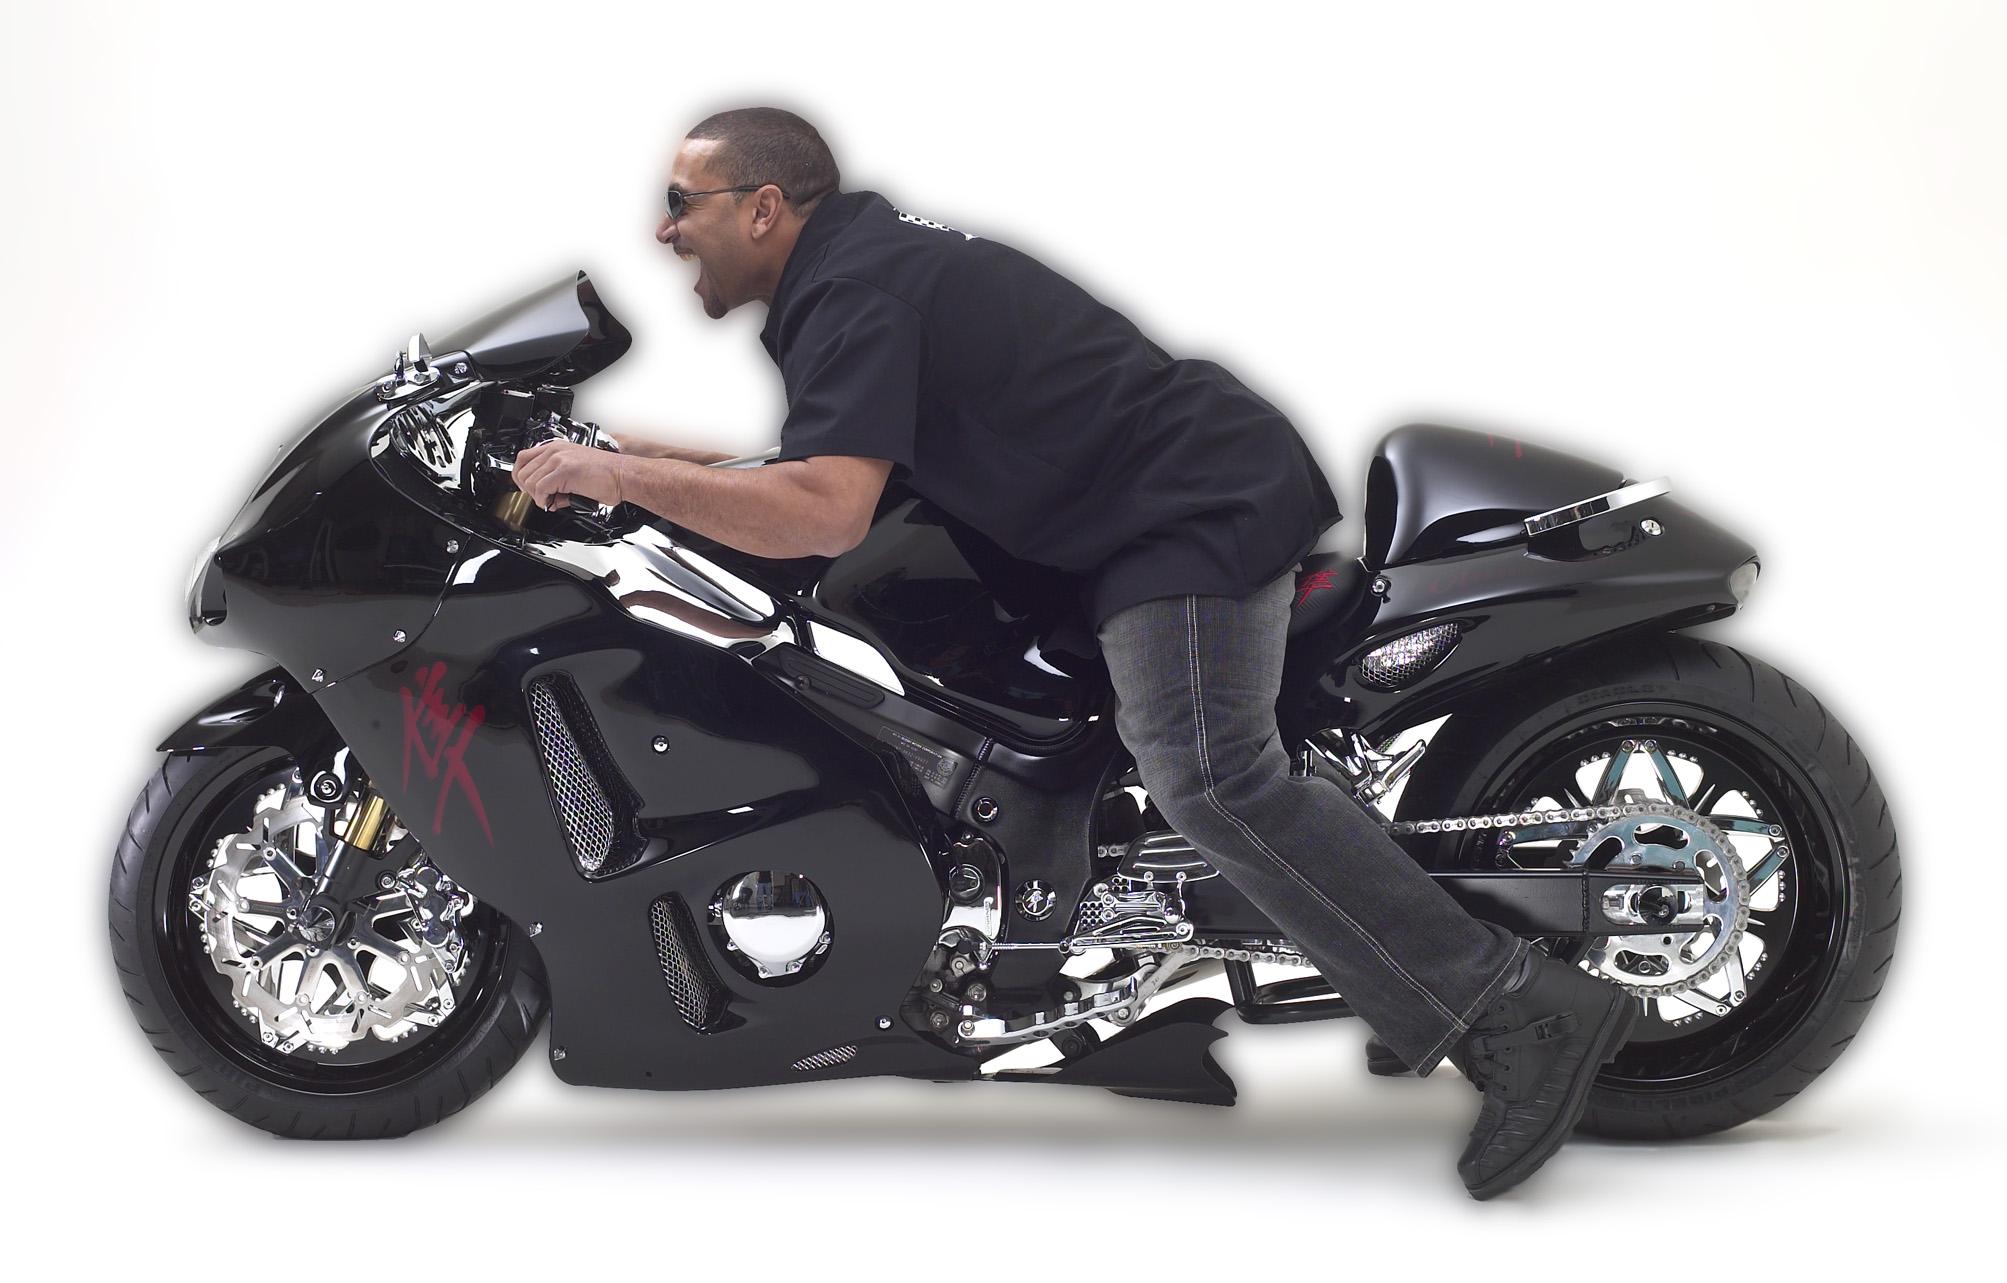 Rick Davis Photographic, Philadelphia, Still Life, Photography, Still Life Photography, Lifestyle, auto, motorcycle, rider